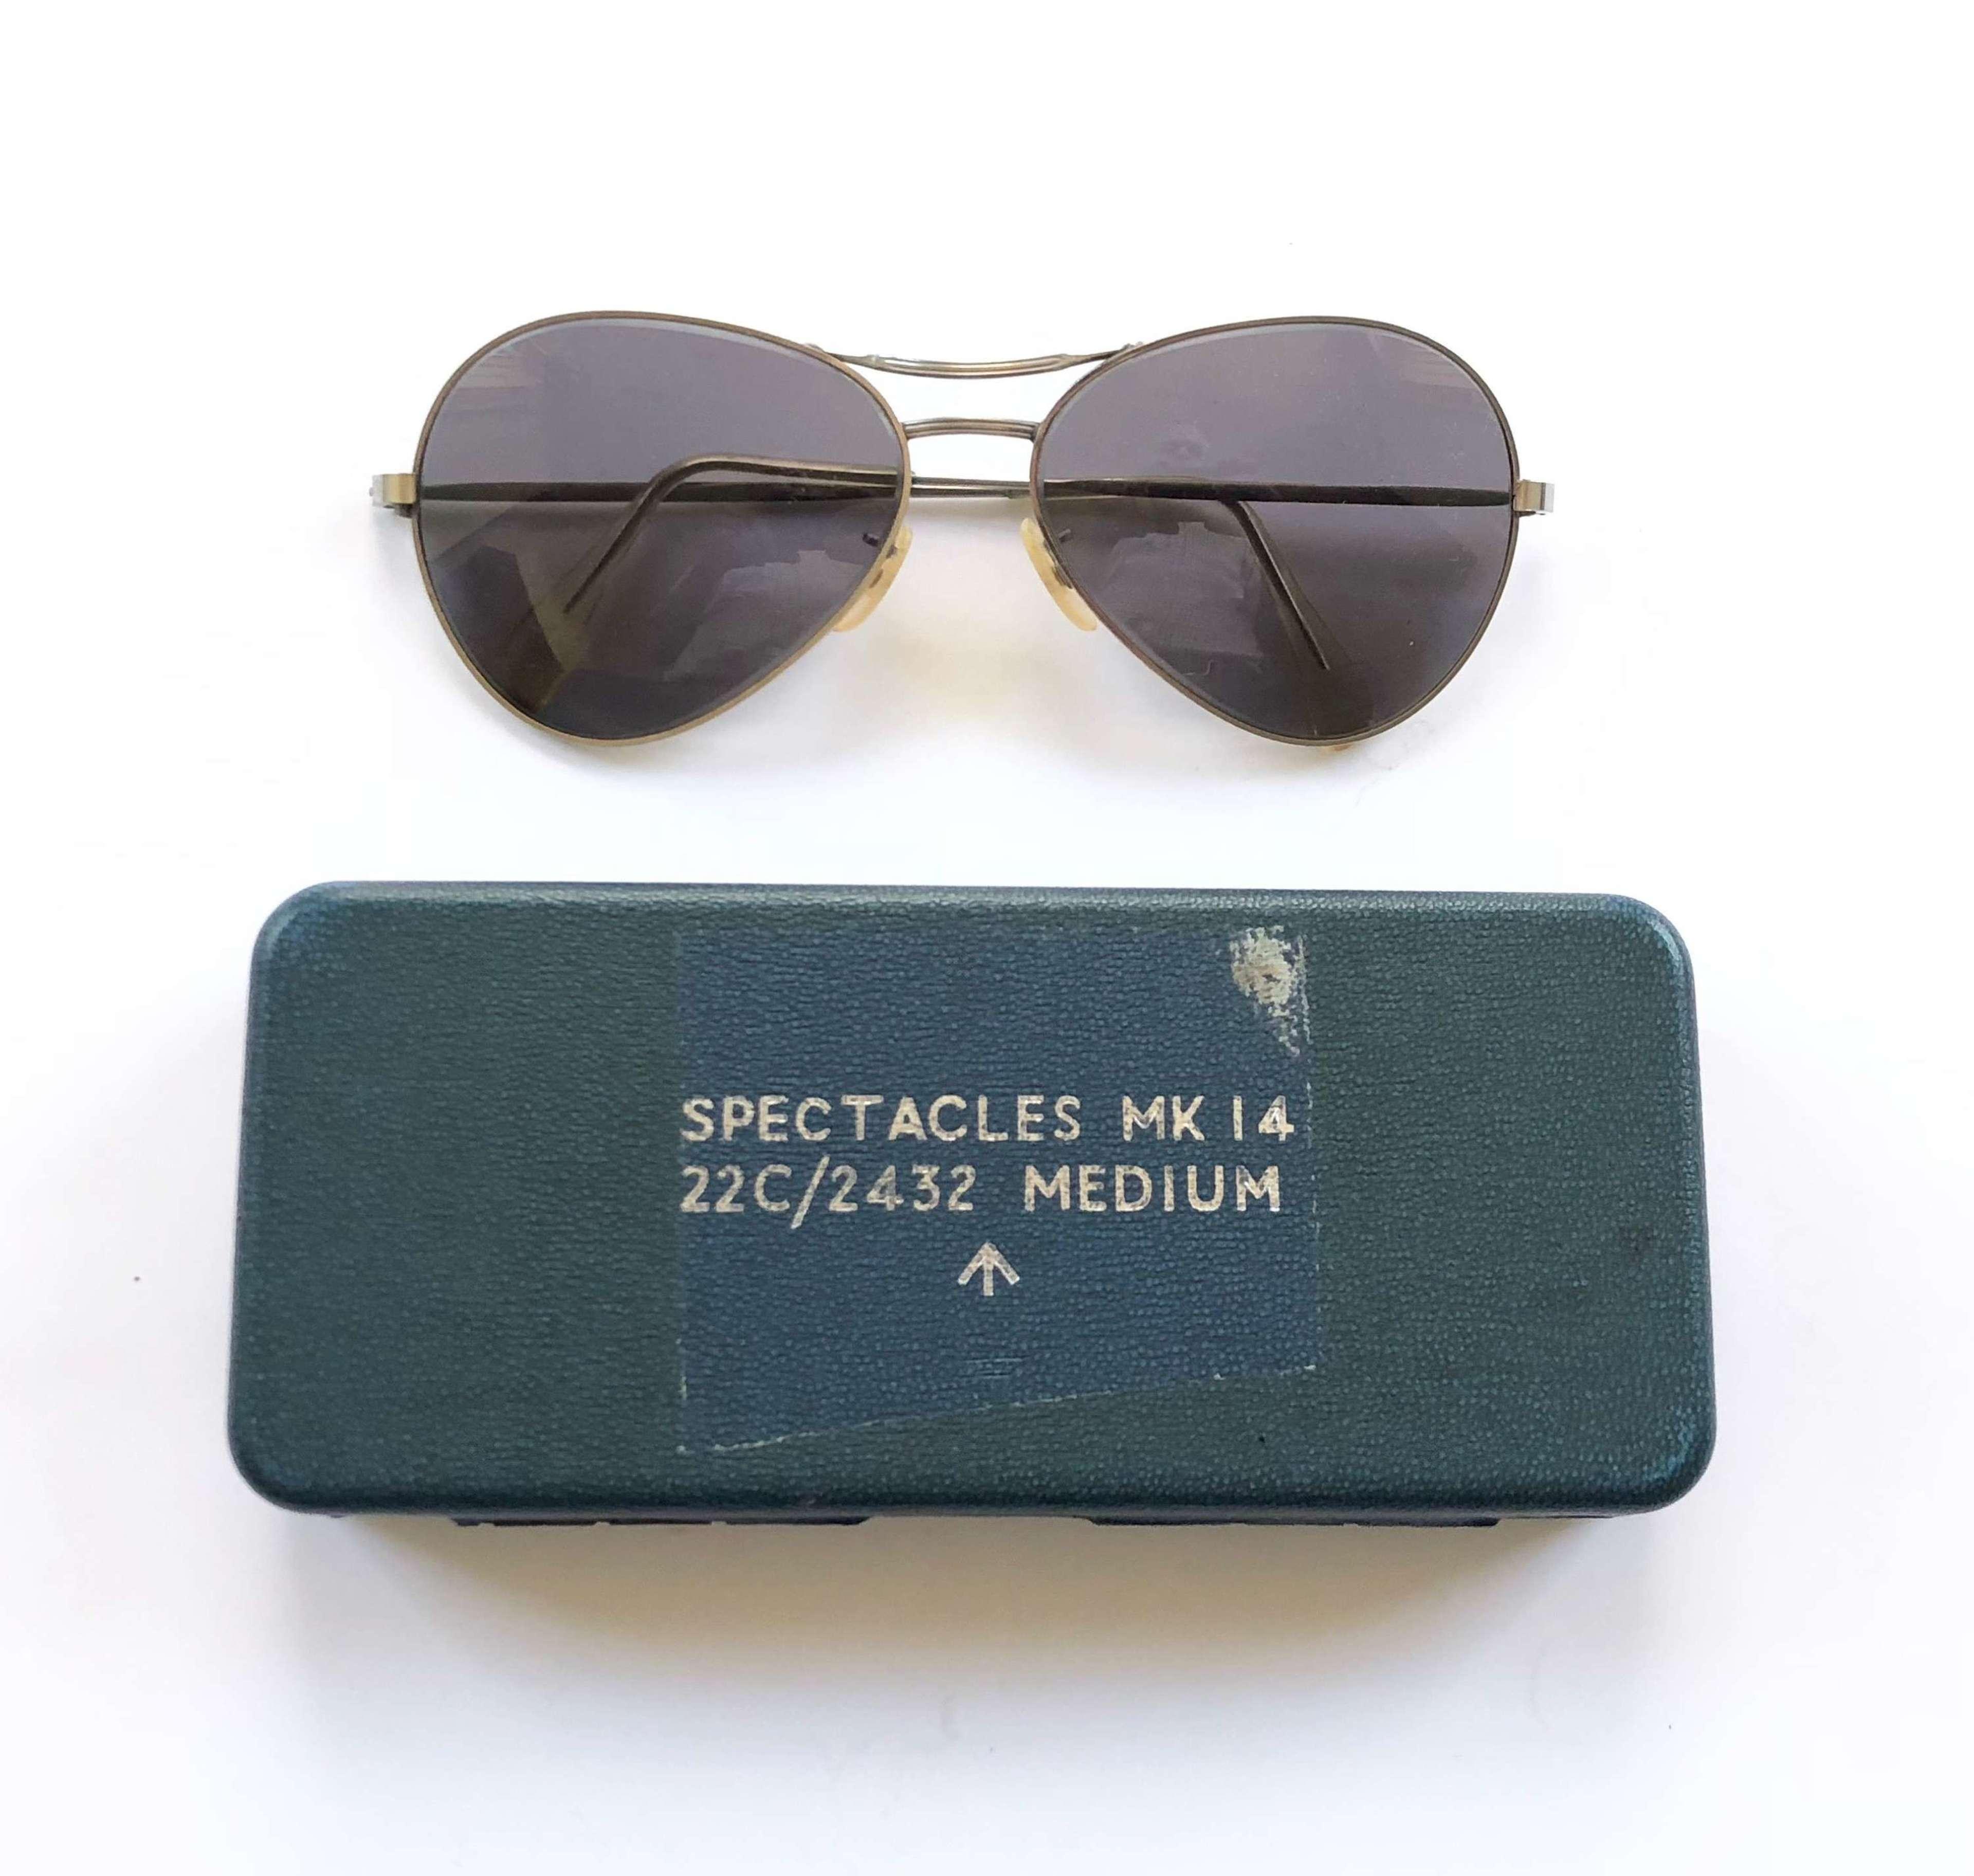 RAF Cold War Period Aircrew Sun Glasses.